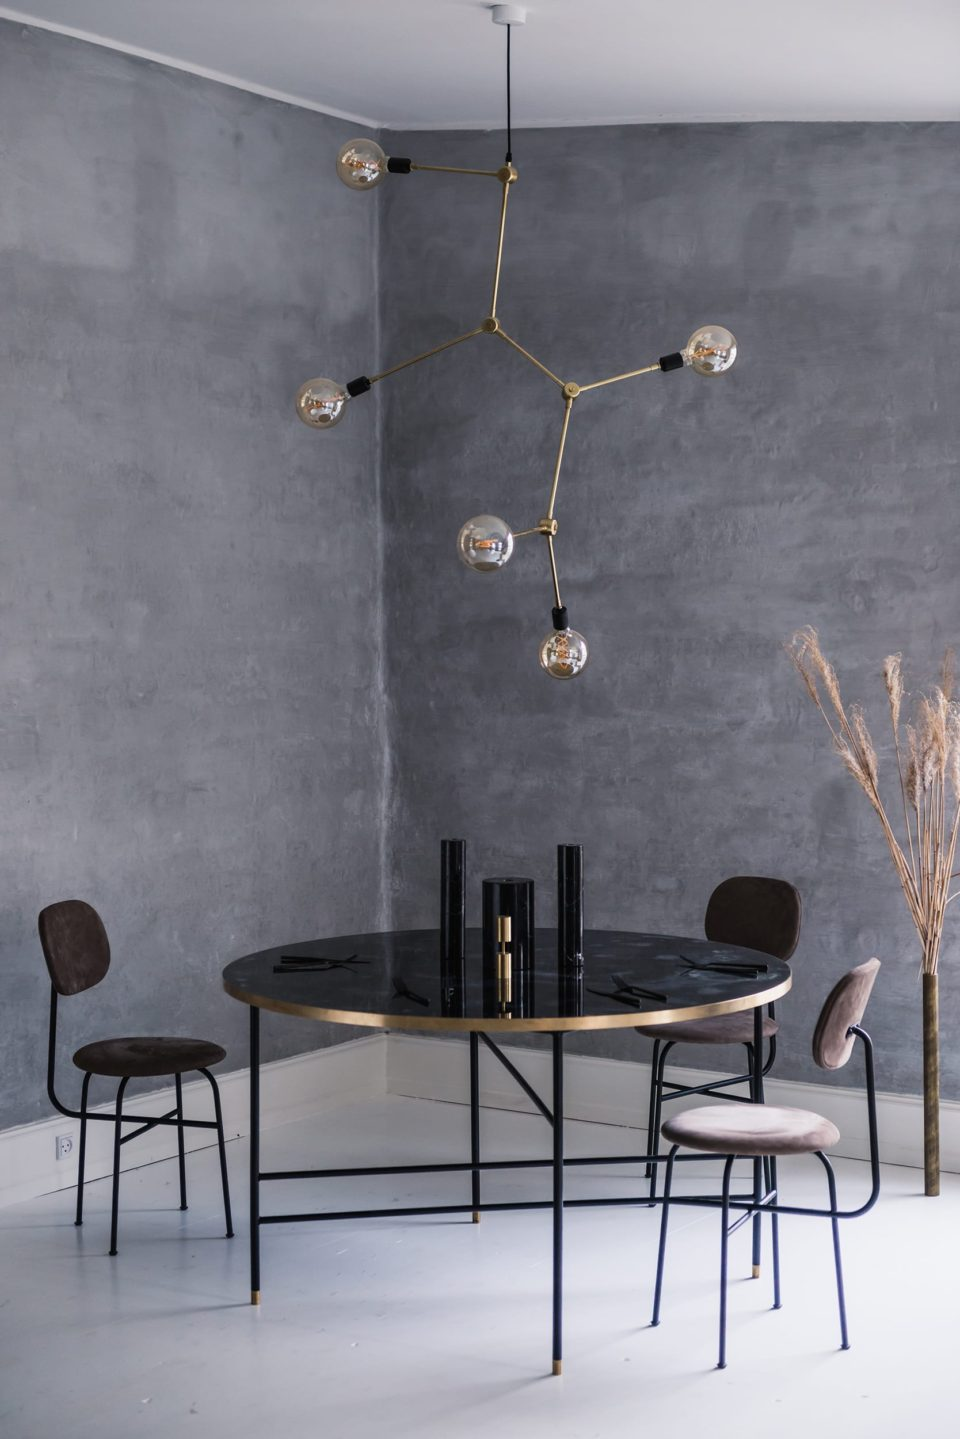 20180217-amanda-lilholt-acetone-collection2082